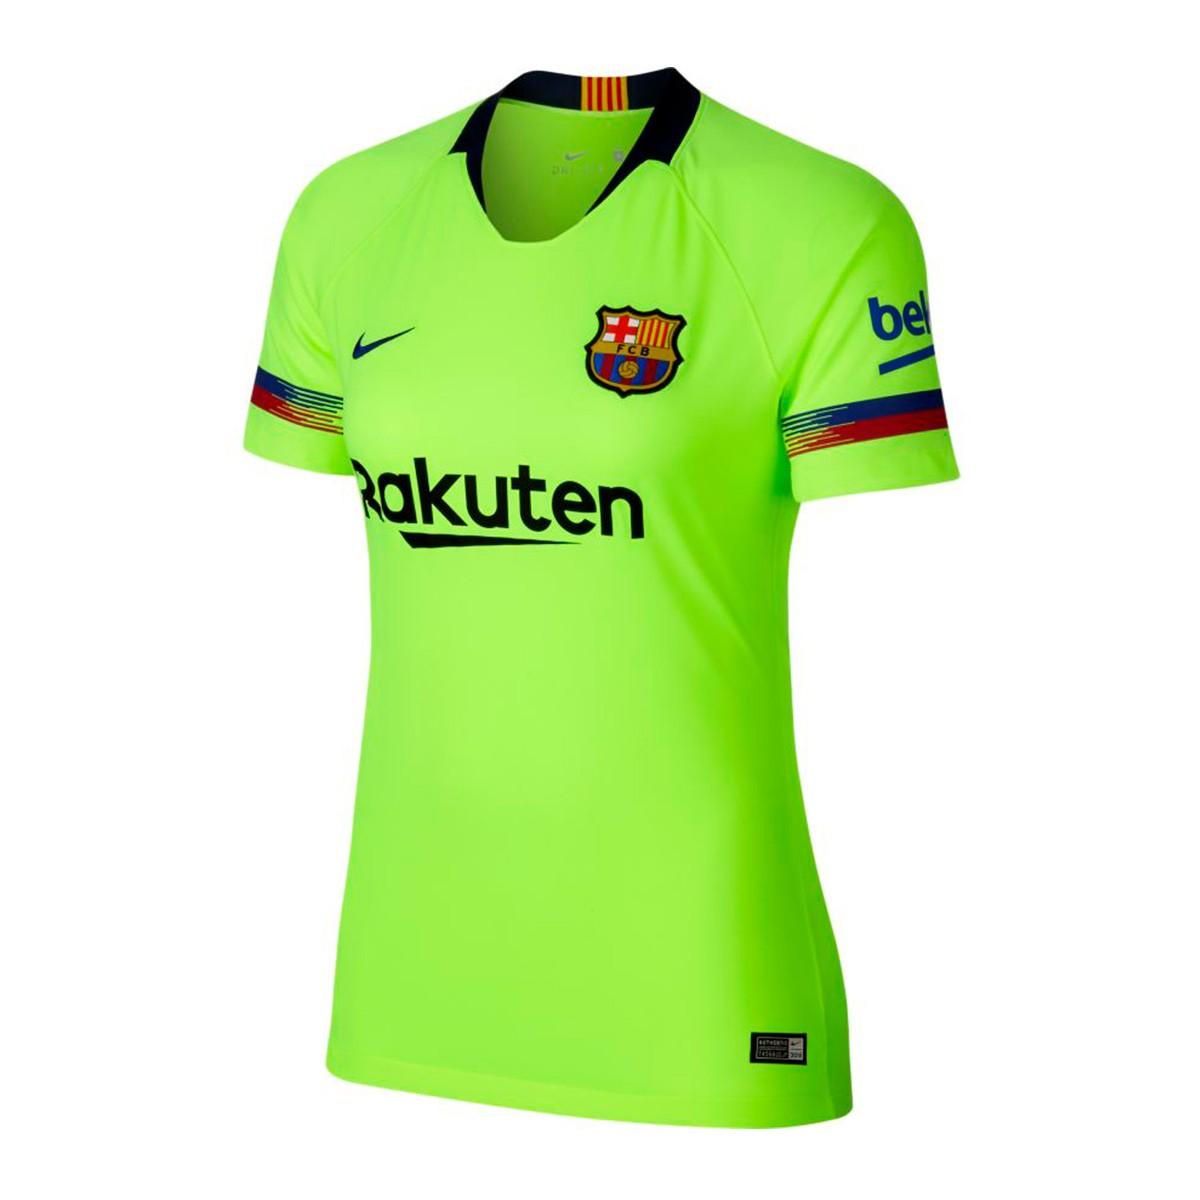 fc42780062043 Camiseta Nike FC Barcelona Stadium Segunda Equipación 2018-2019 Mujer  Volt-Deep royal blue - Tienda de fútbol Fútbol Emotion